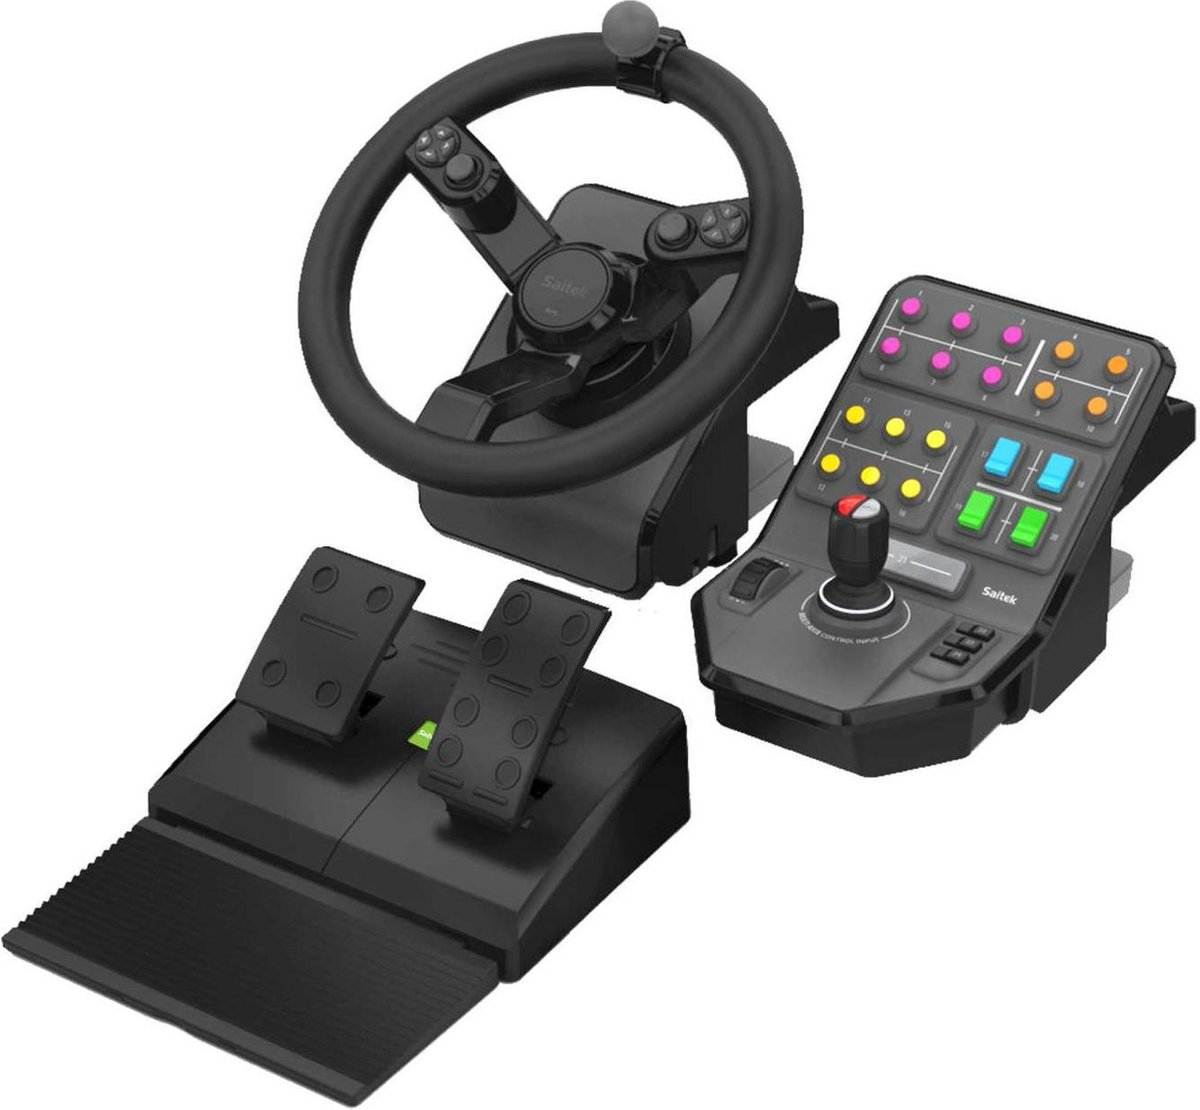 Logitech G Saitek Heavy Equipment bundel - Farming Simulator controller